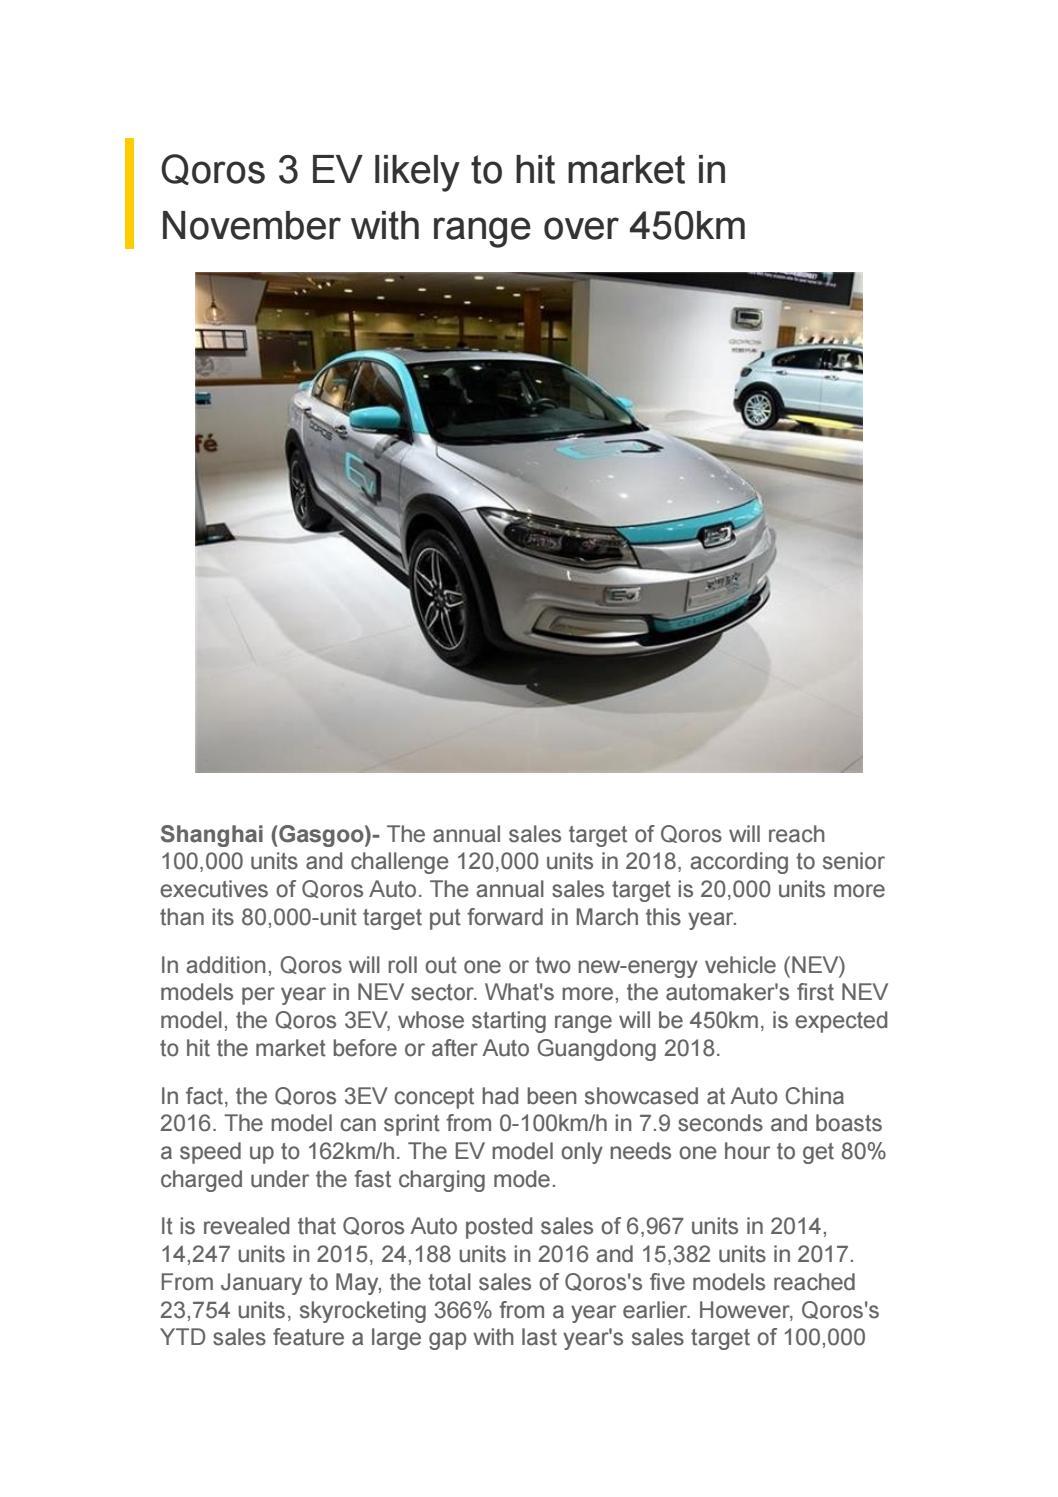 0bd496dda1c Qoros 3 EV likely to hit market in November with range over 450km by  gasgoo.com - issuu